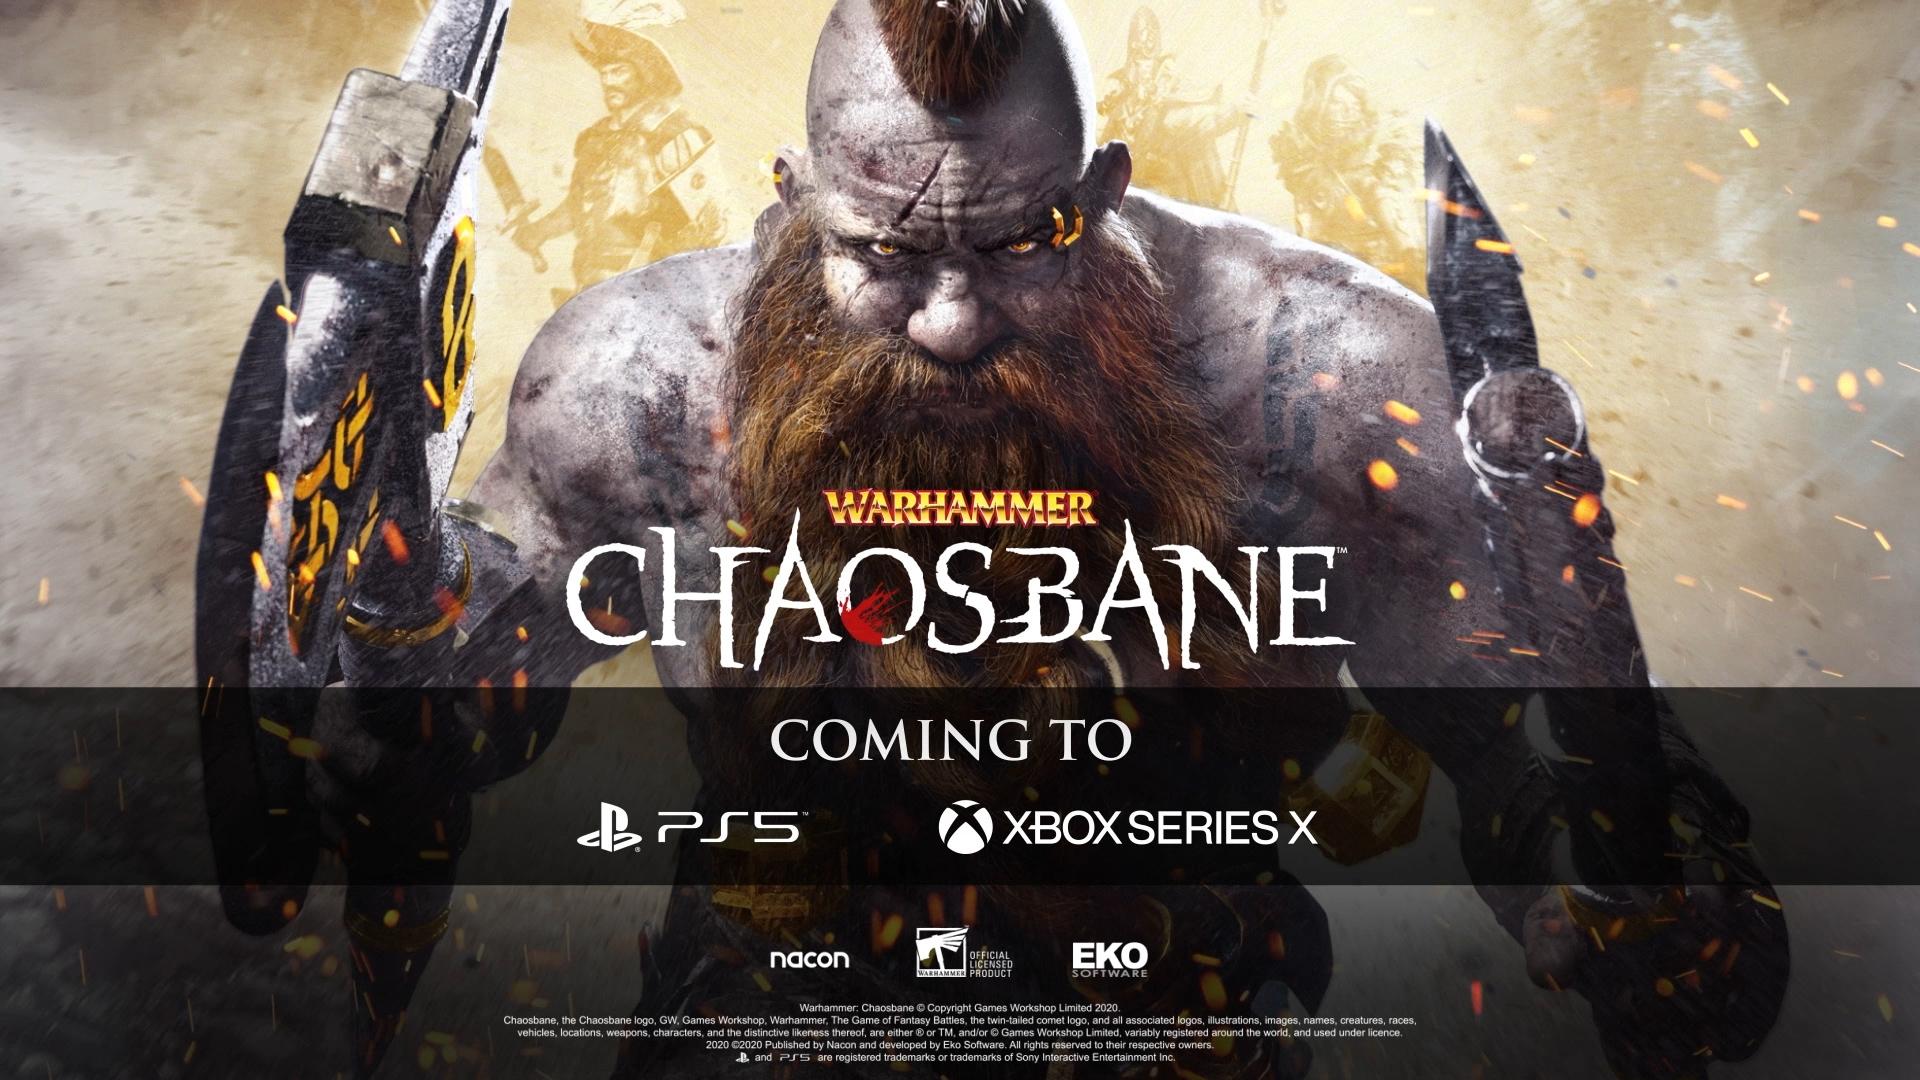 Warhammer: Chaosbane coming to PS5, Xbox Series X - Gematsu